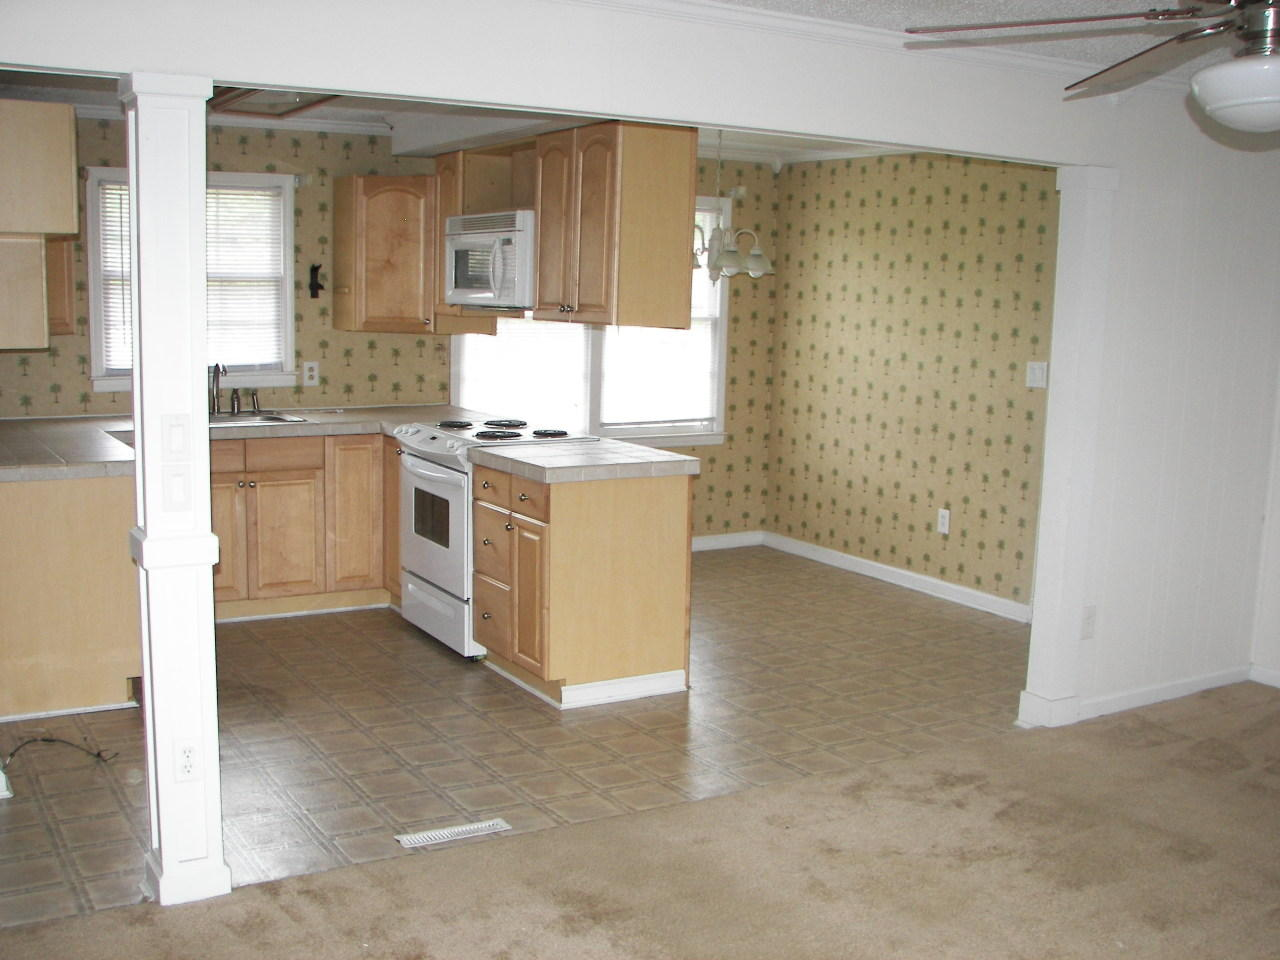 Glendale Acres Homes For Sale - 214 Ruby, Summerville, SC - 0